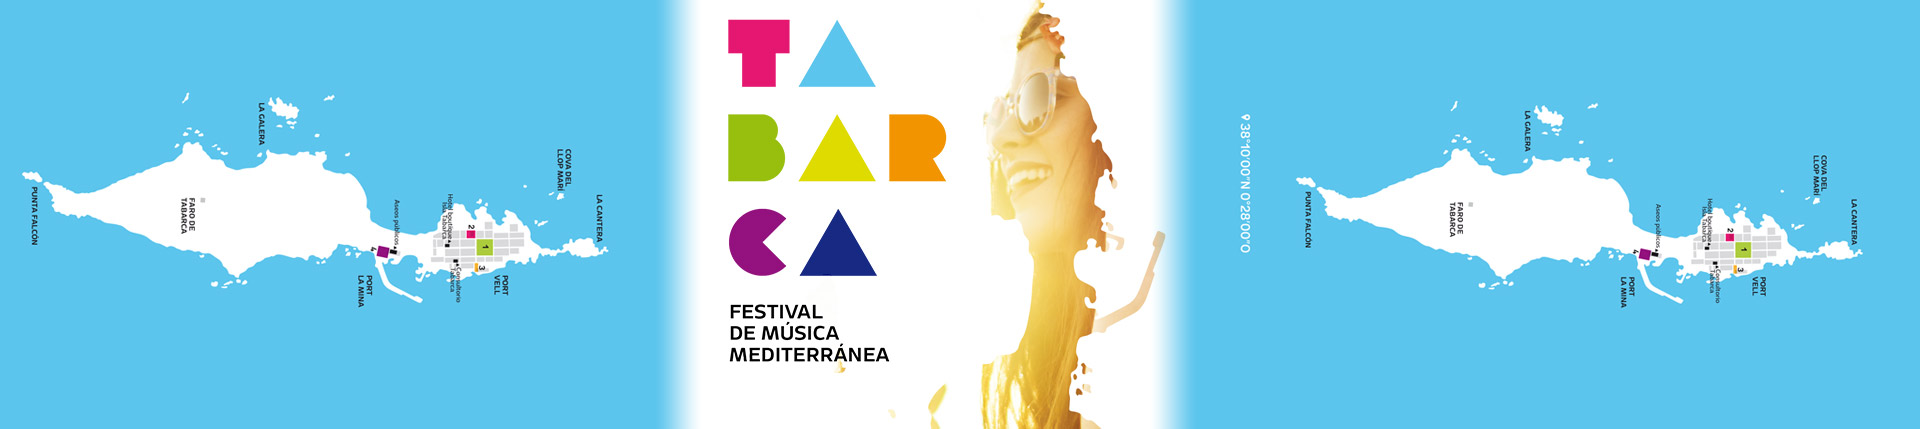 Festival de Música mediterránea de Tabarca